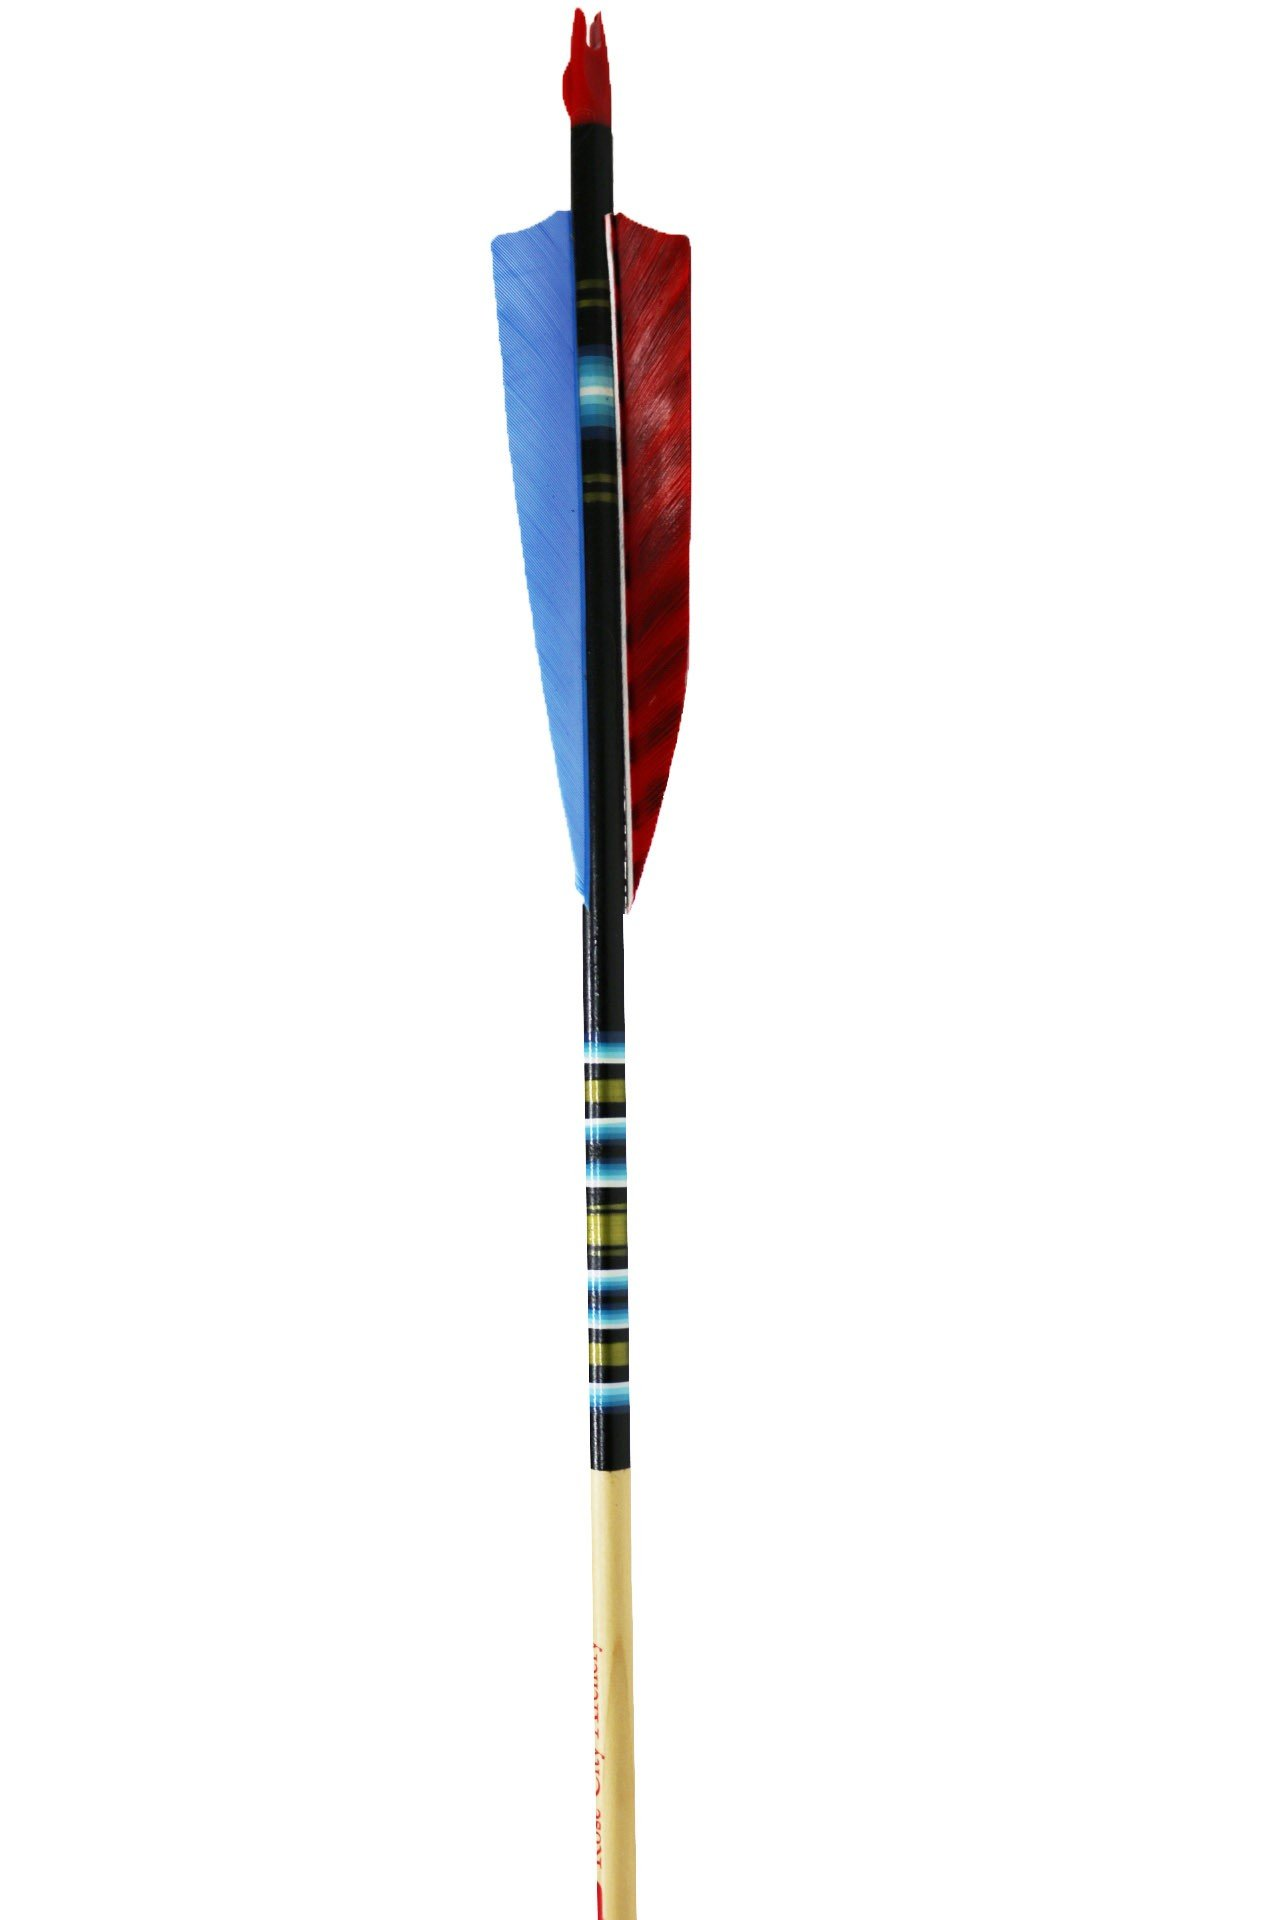 Rose City Archery Port Orford Cedar Fancy Arrows with 4'' Shield Fletch (12 Pack), Black/Clear